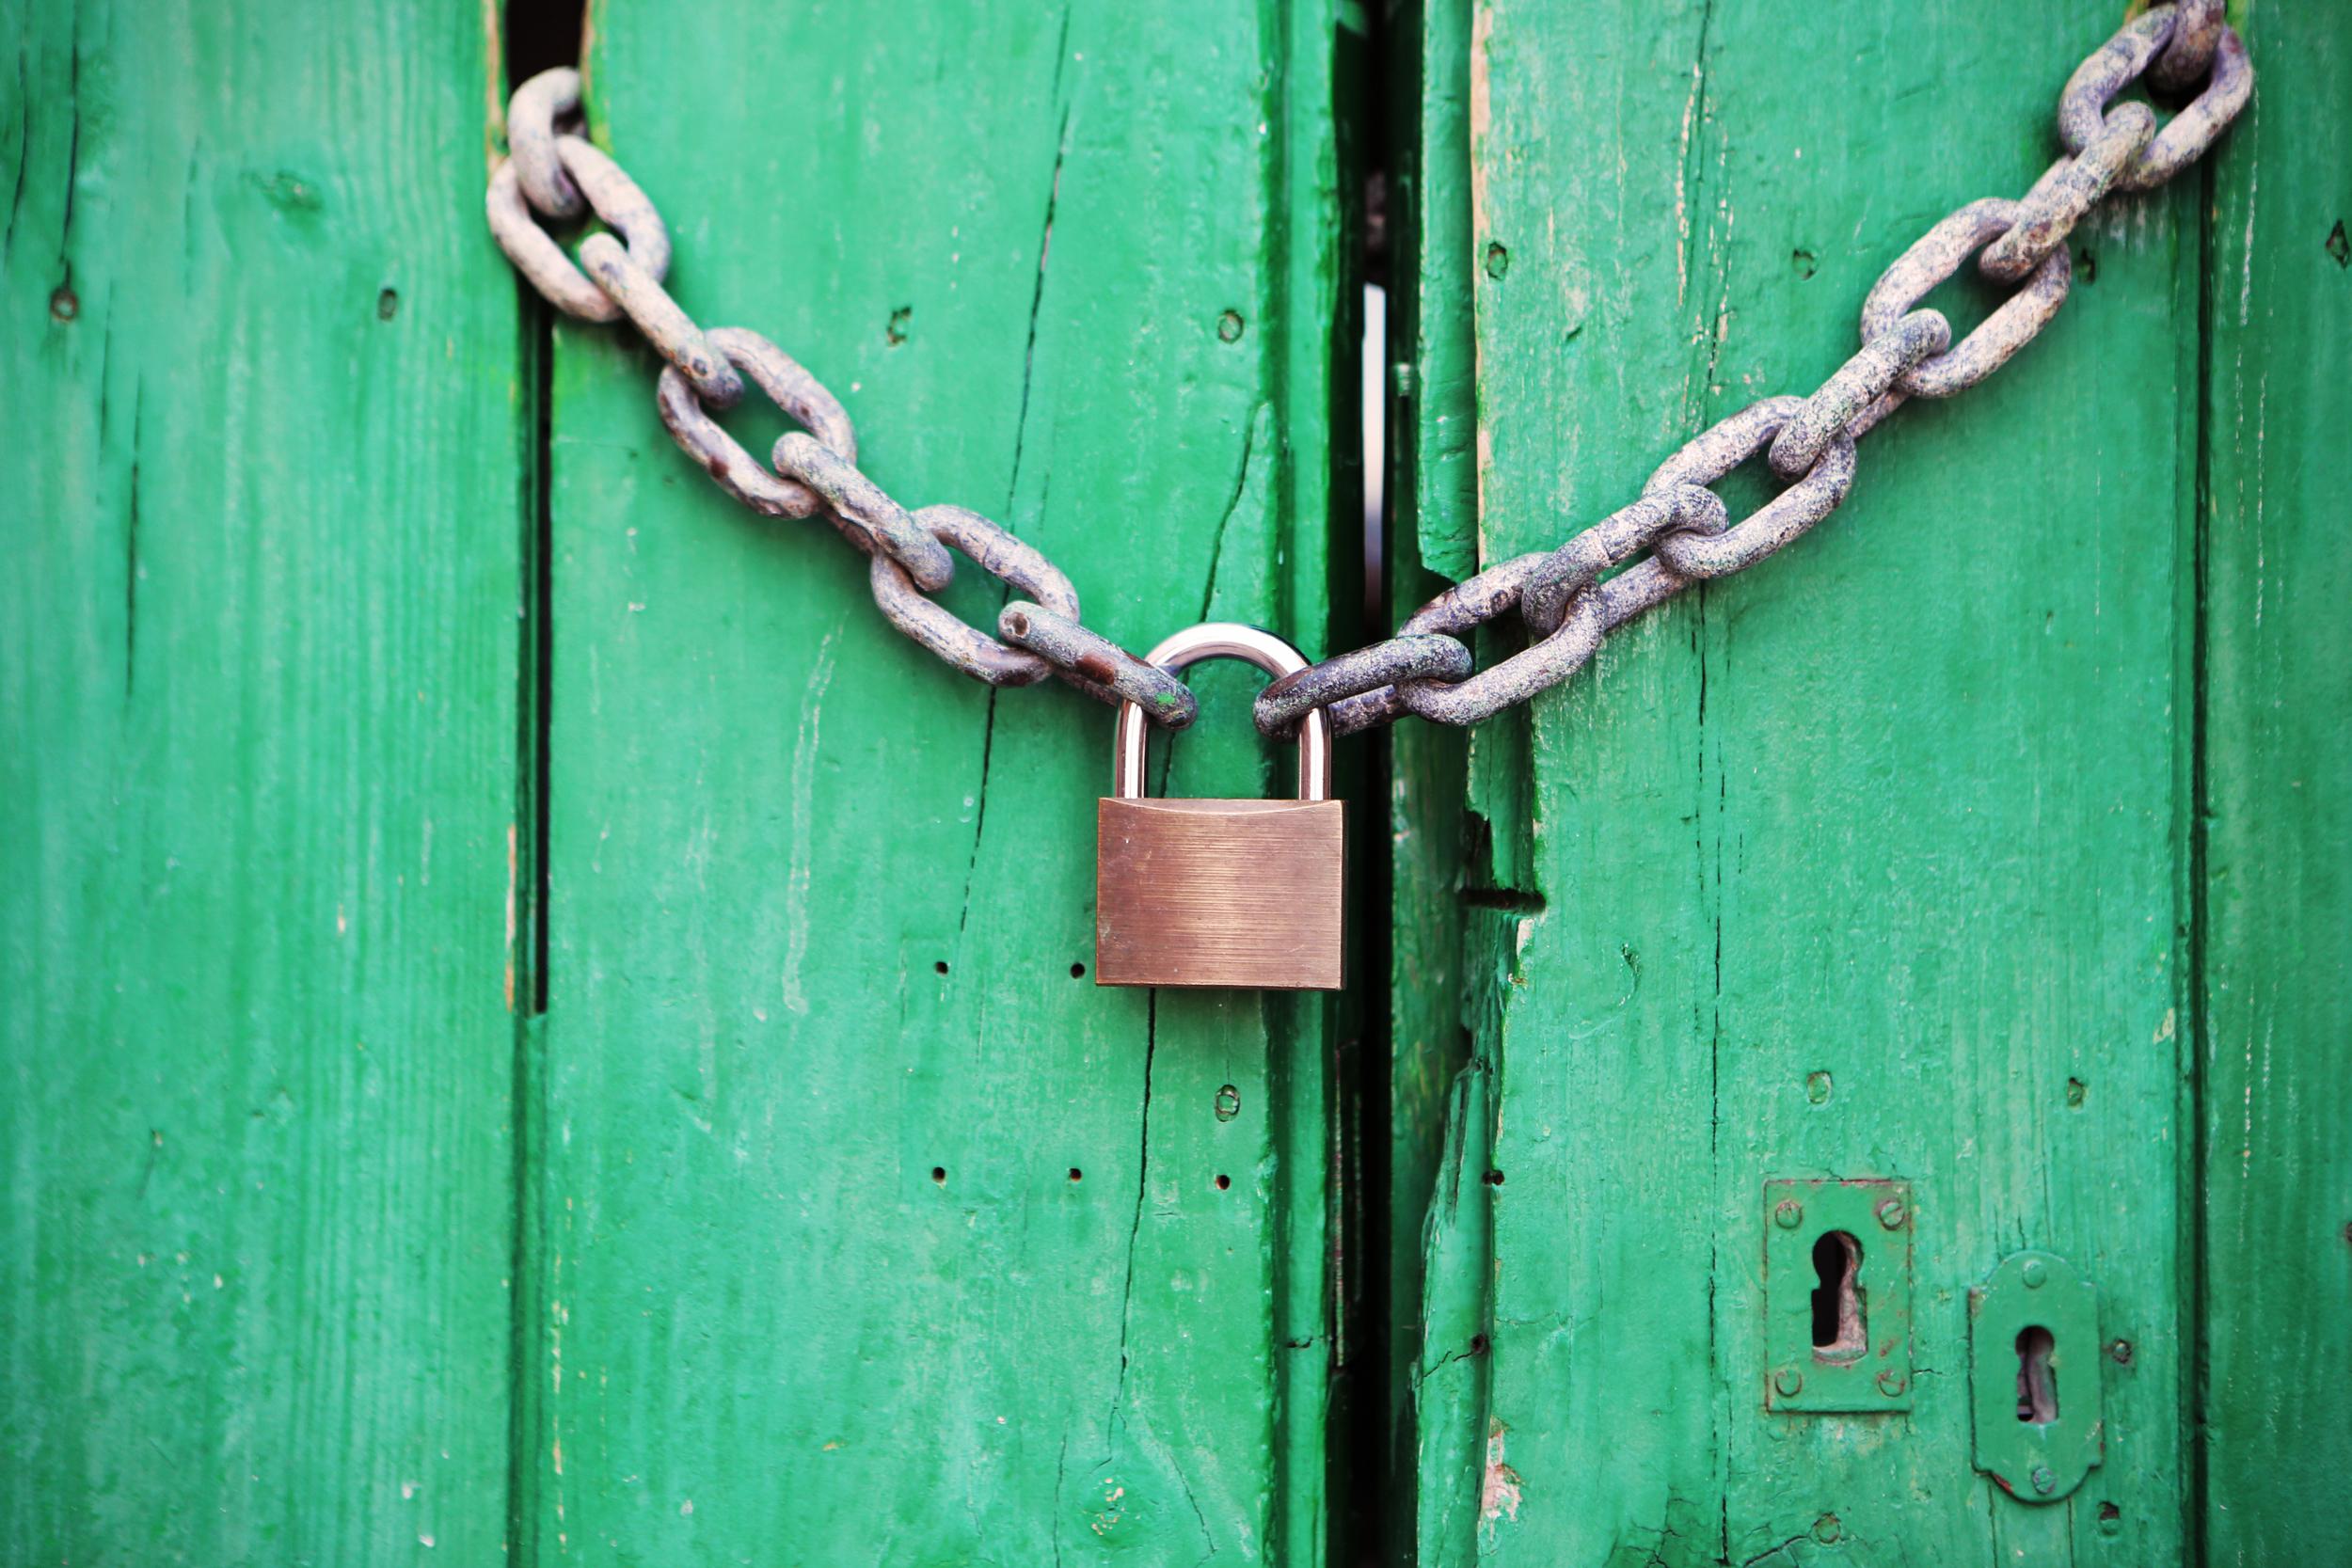 2014_07_life-of-pix-free-stock-photos-spain-door-padlock.jpg